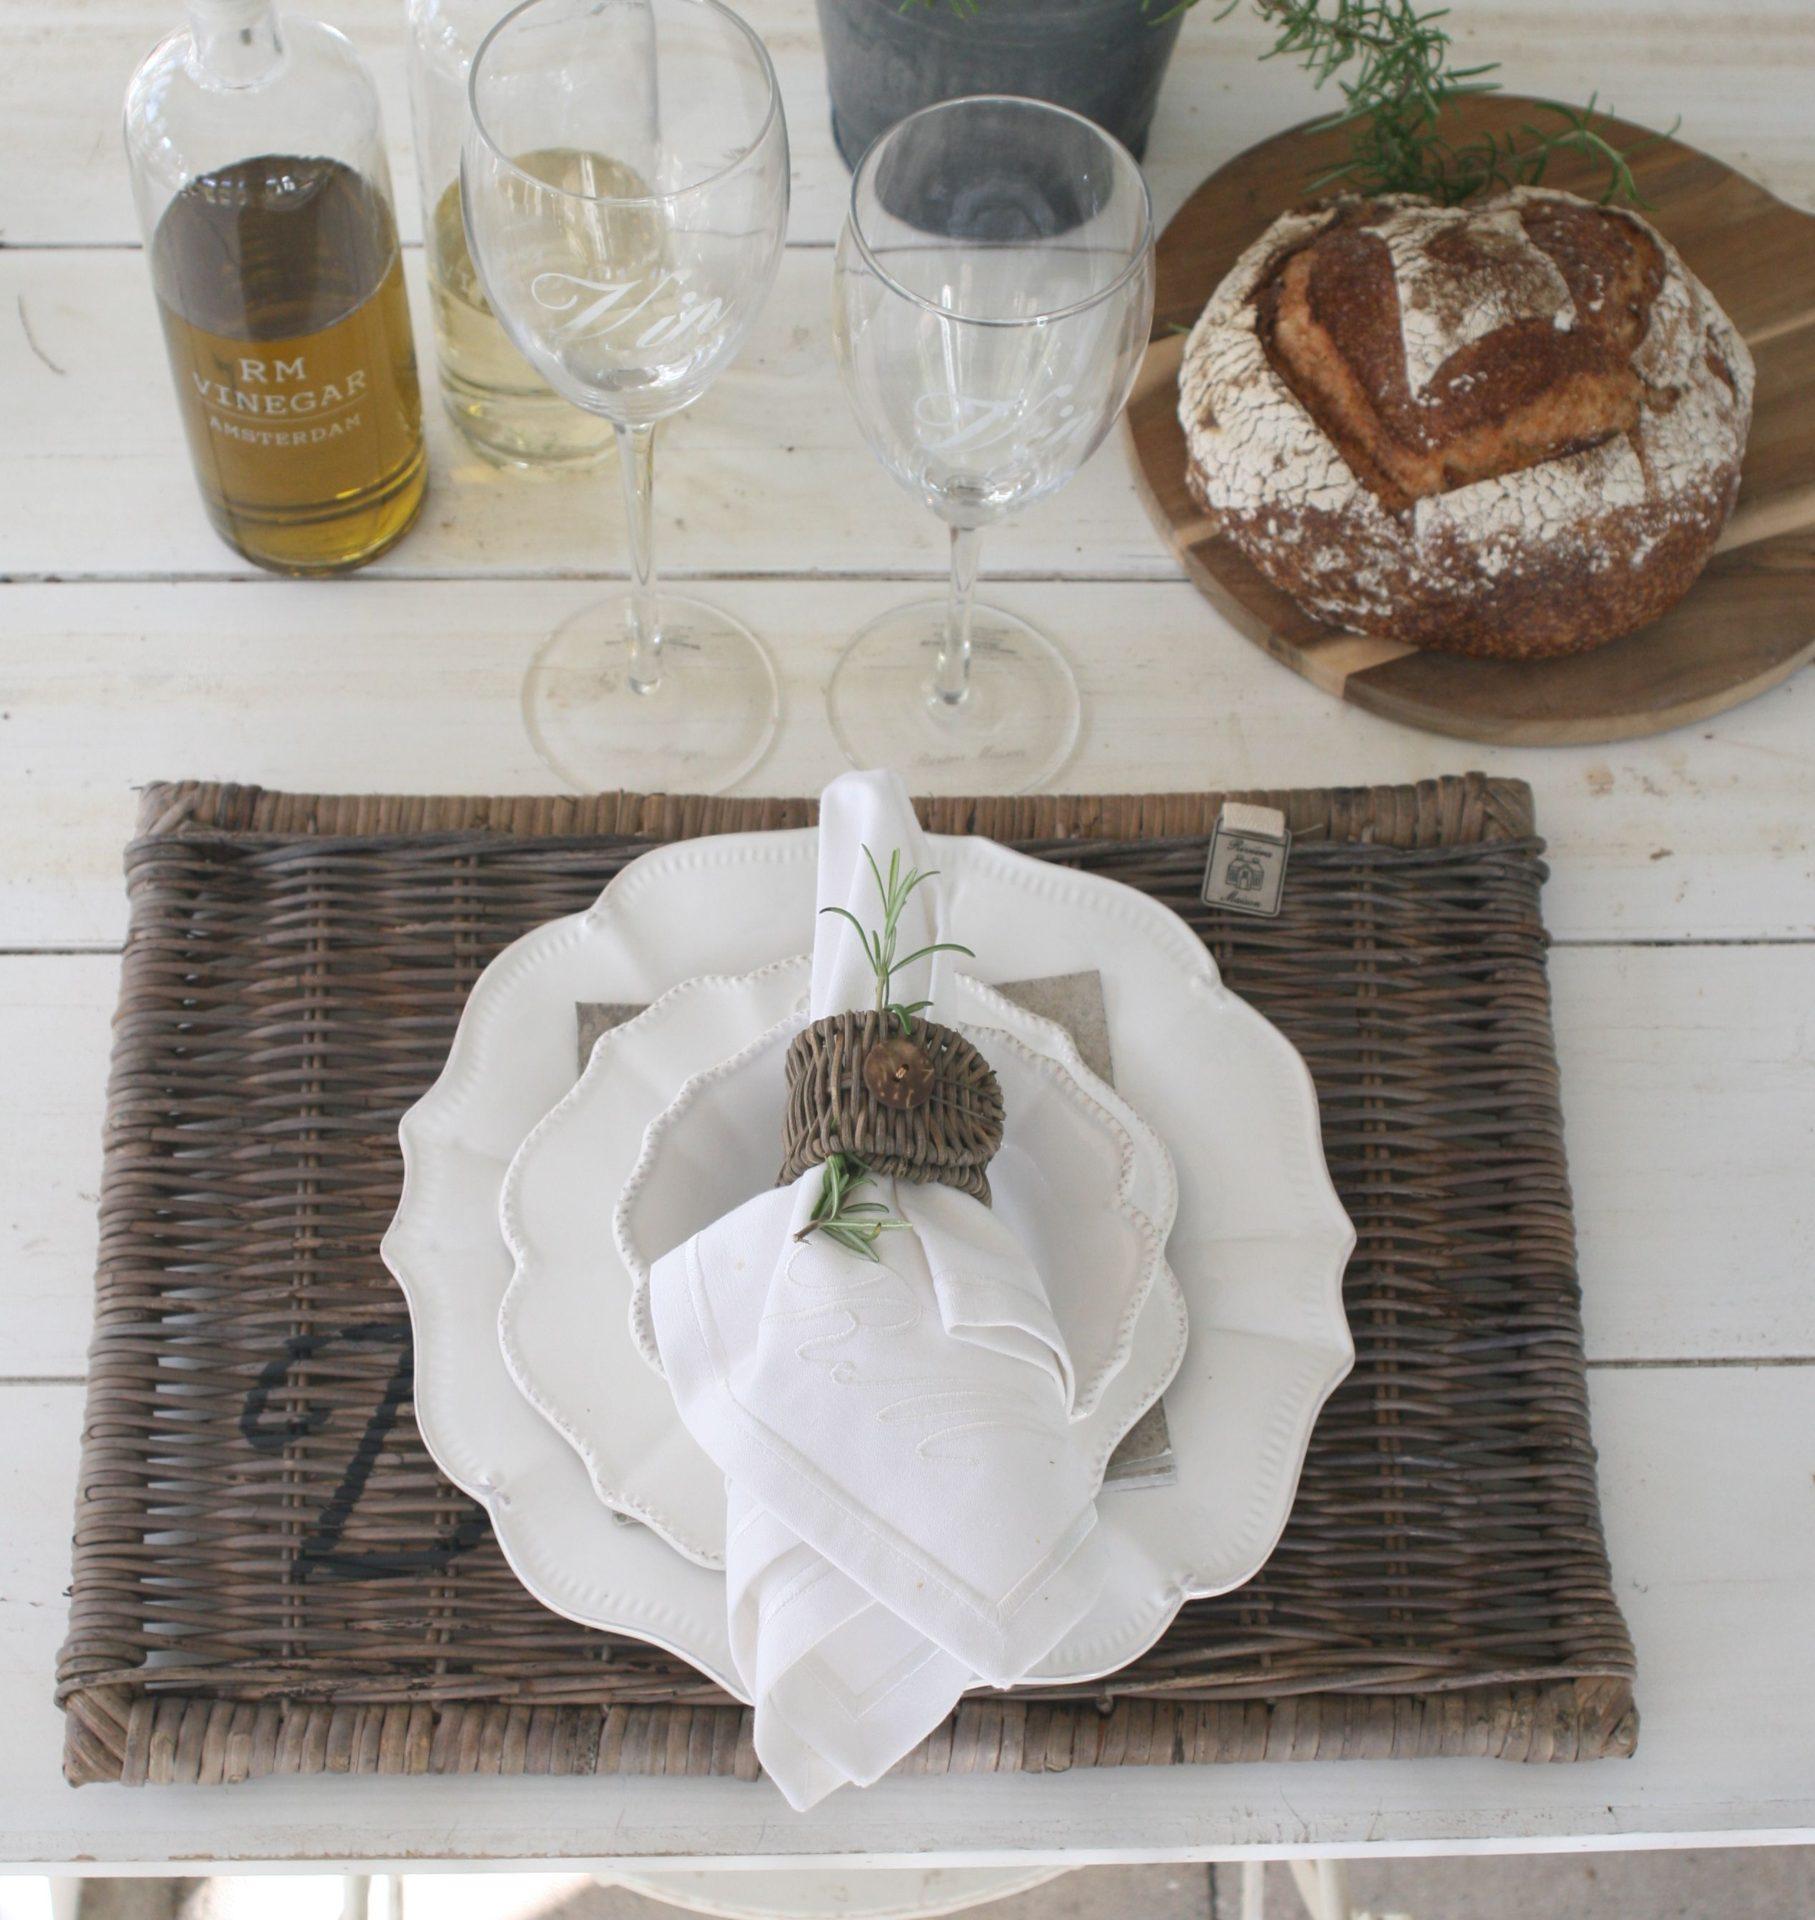 Dækkeserviet - Rustic rattan placemat diner